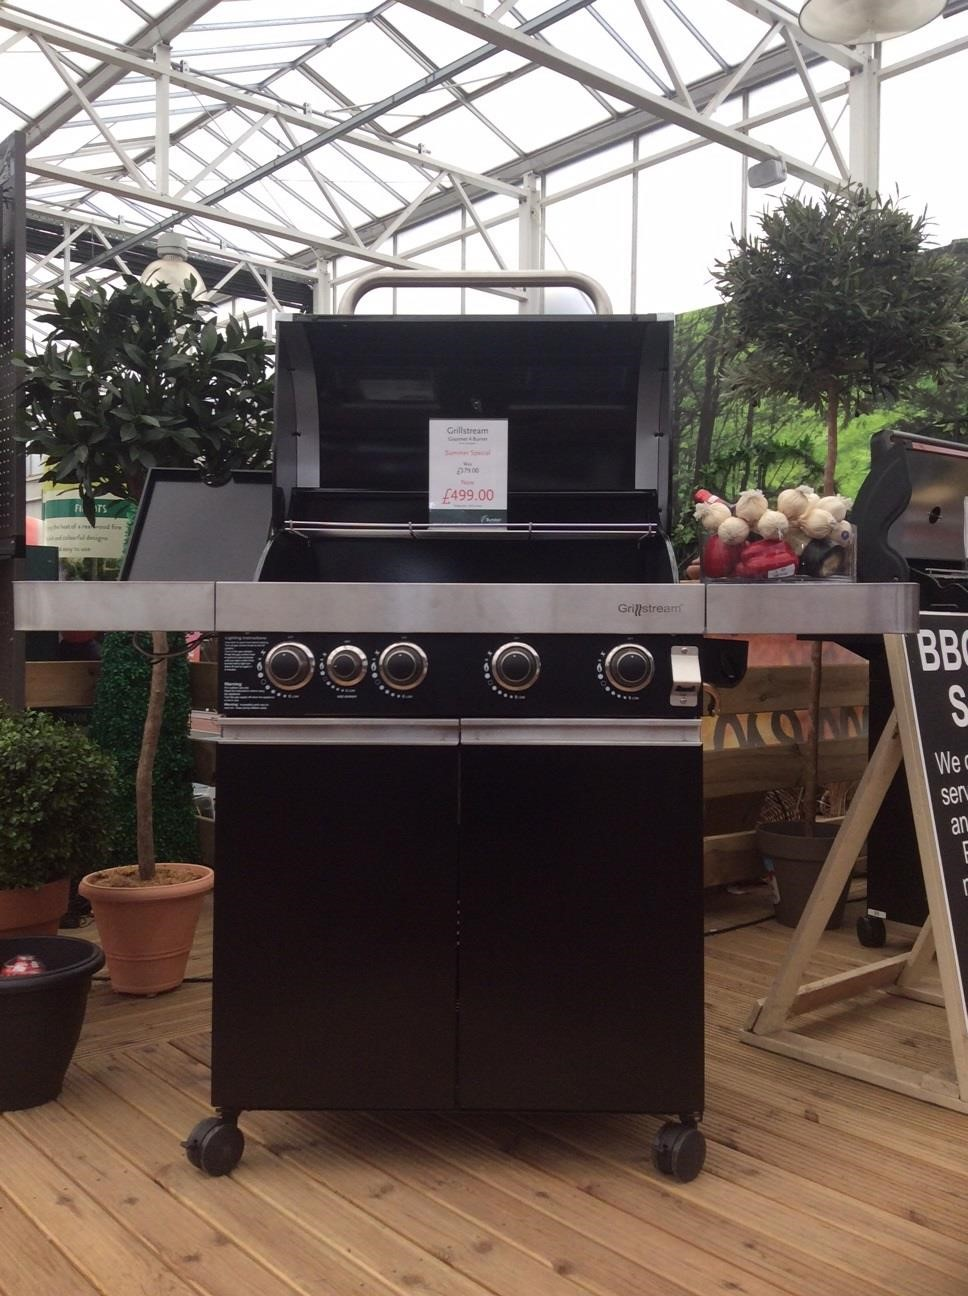 Grillstream 2 burner roaster BBQ at Burston Garden Centre